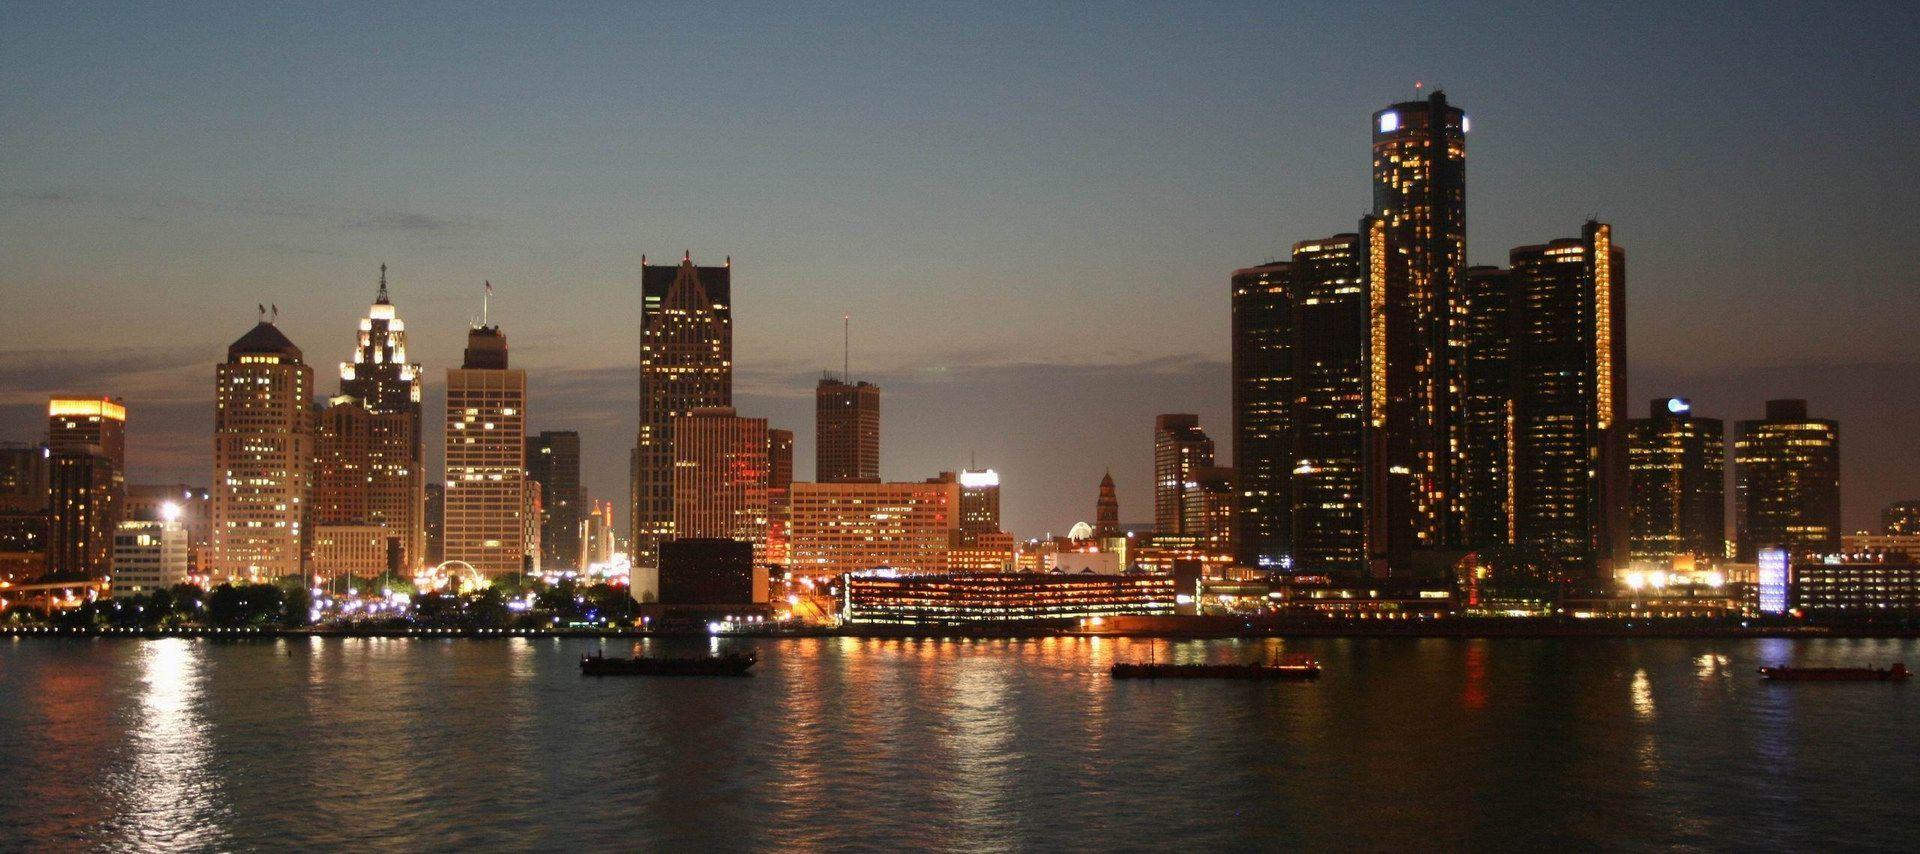 Nighttime Skyline Detroit Skyline Detroit Michigan Skyline